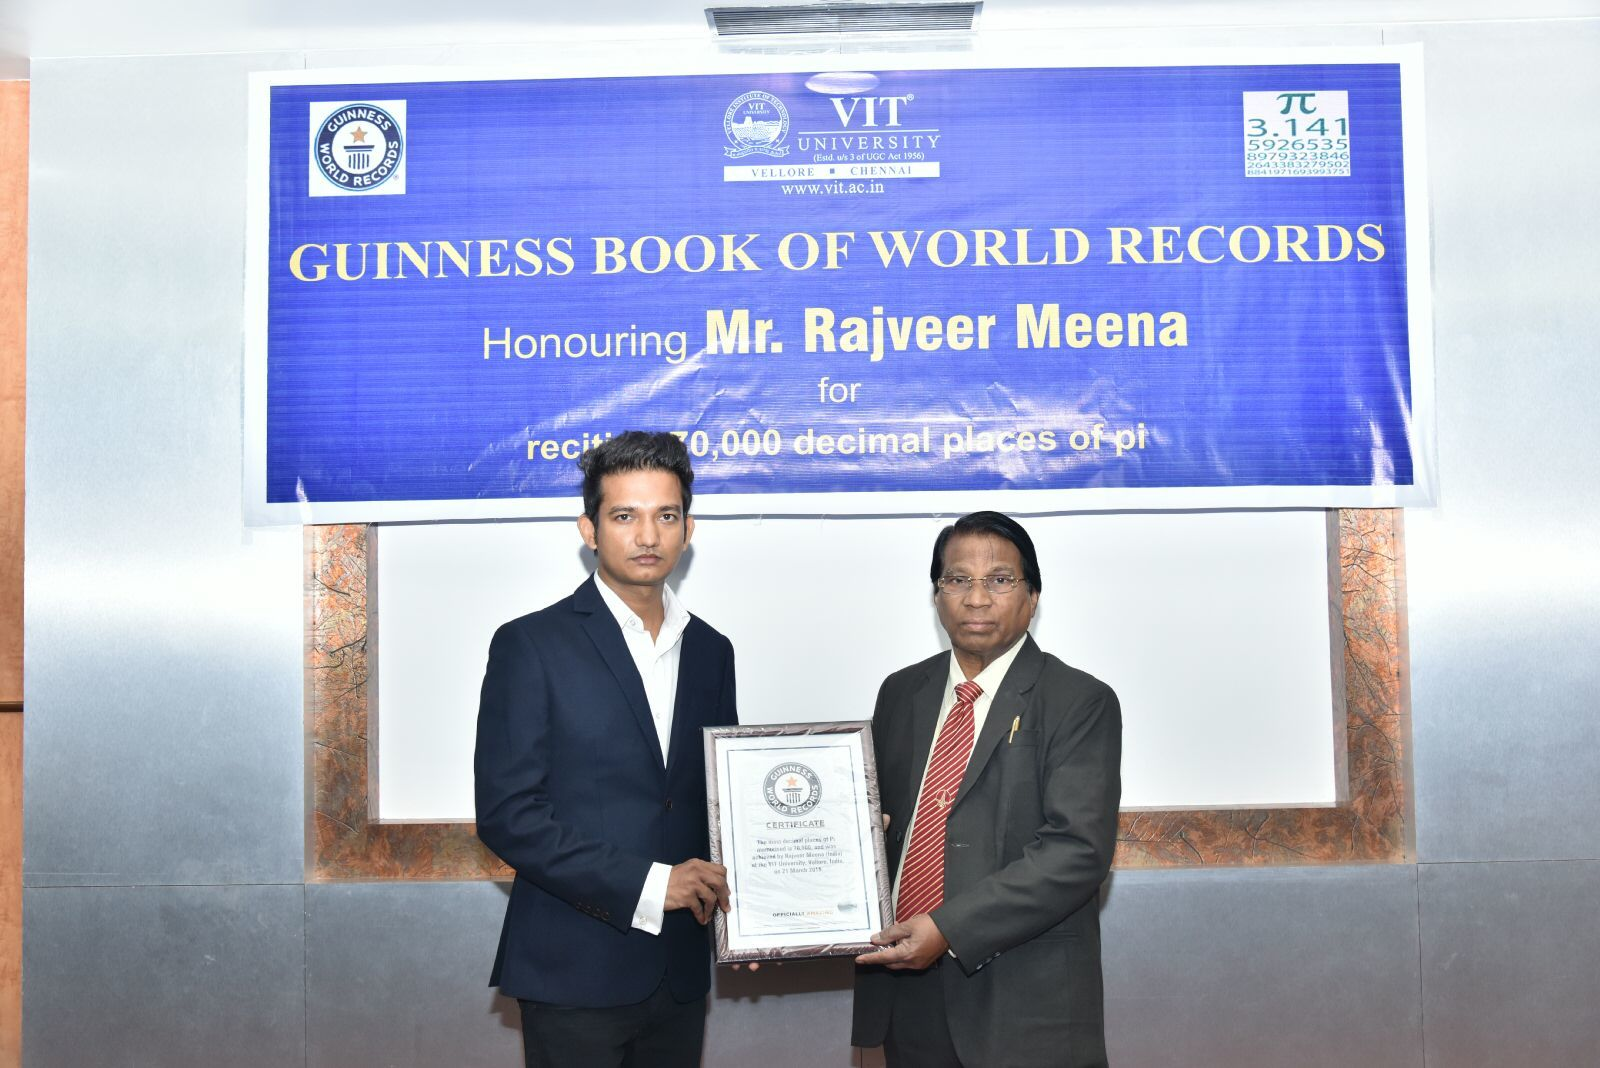 Image result for rajveer meena guinness world record